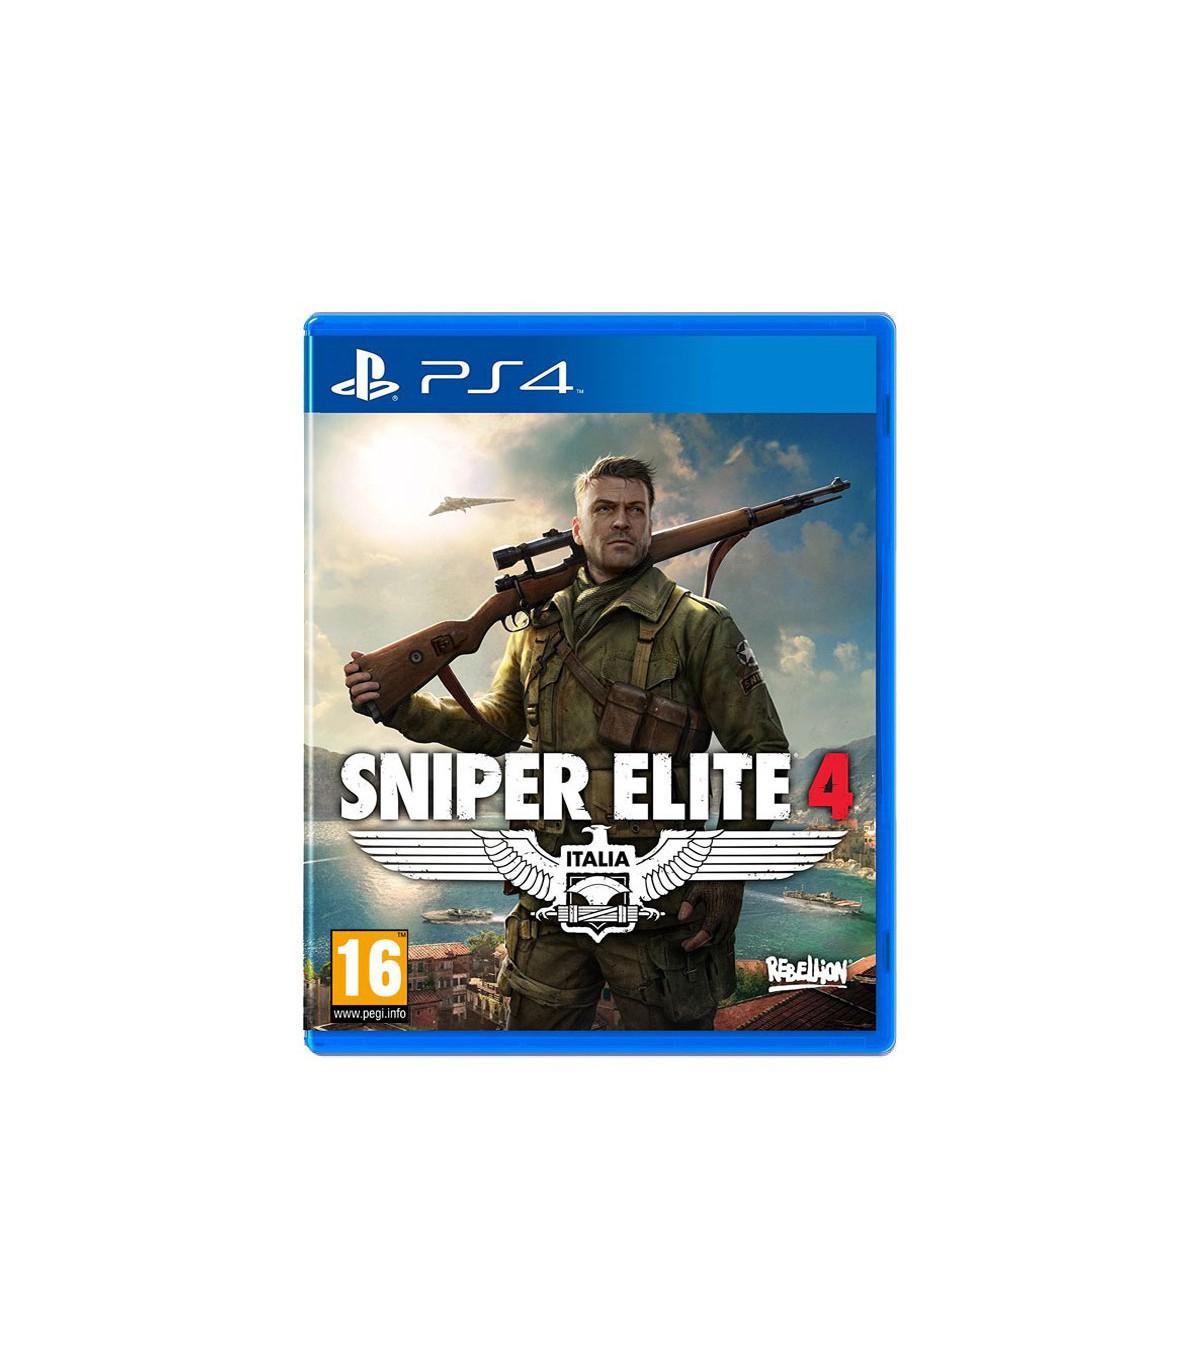 Sniper Elite 4 کارکرده - پلی استیشن ۴